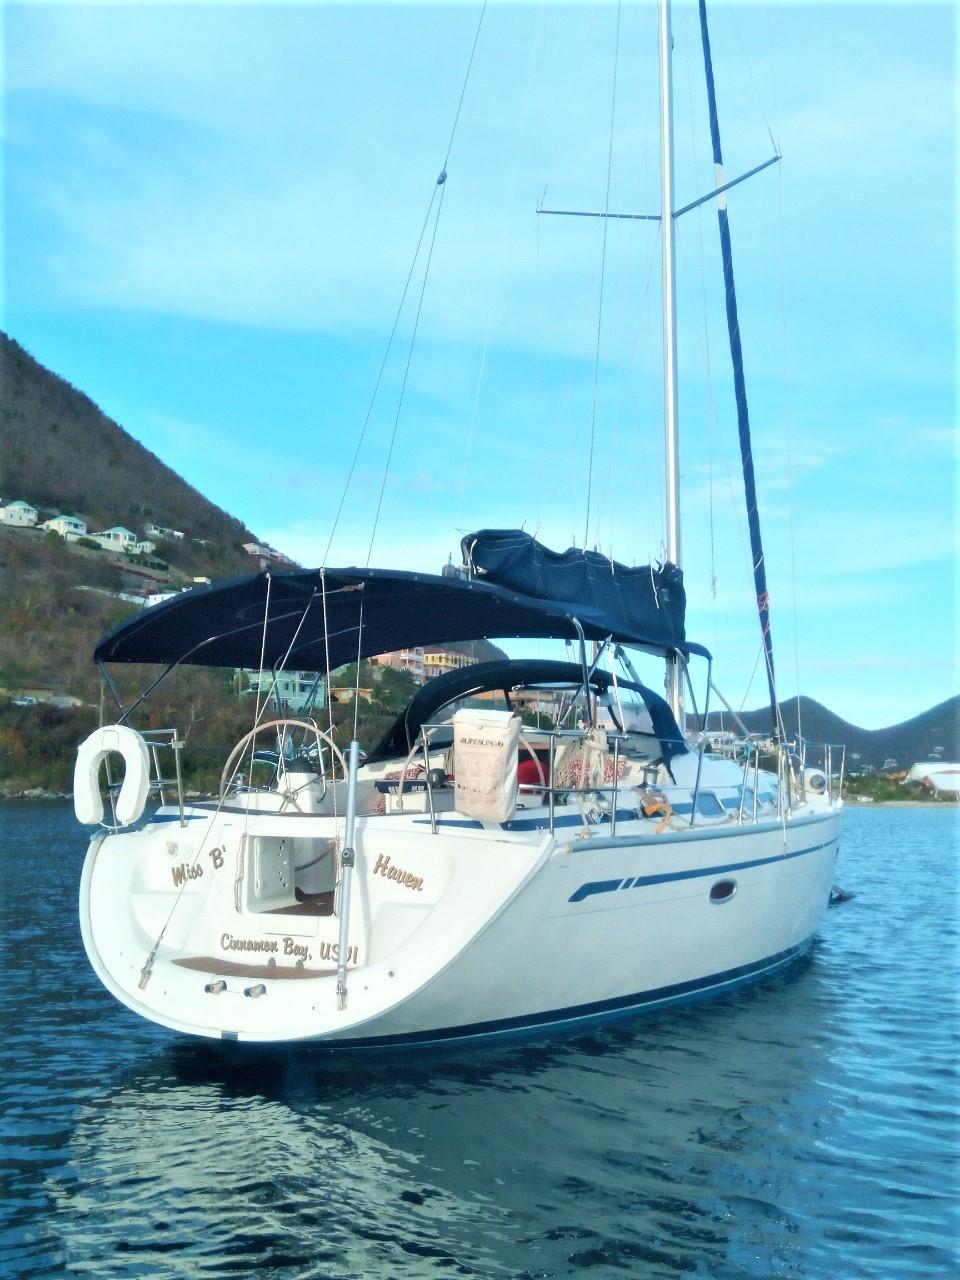 Bavaria 42 Cruiser Miss'B Haven at anchor